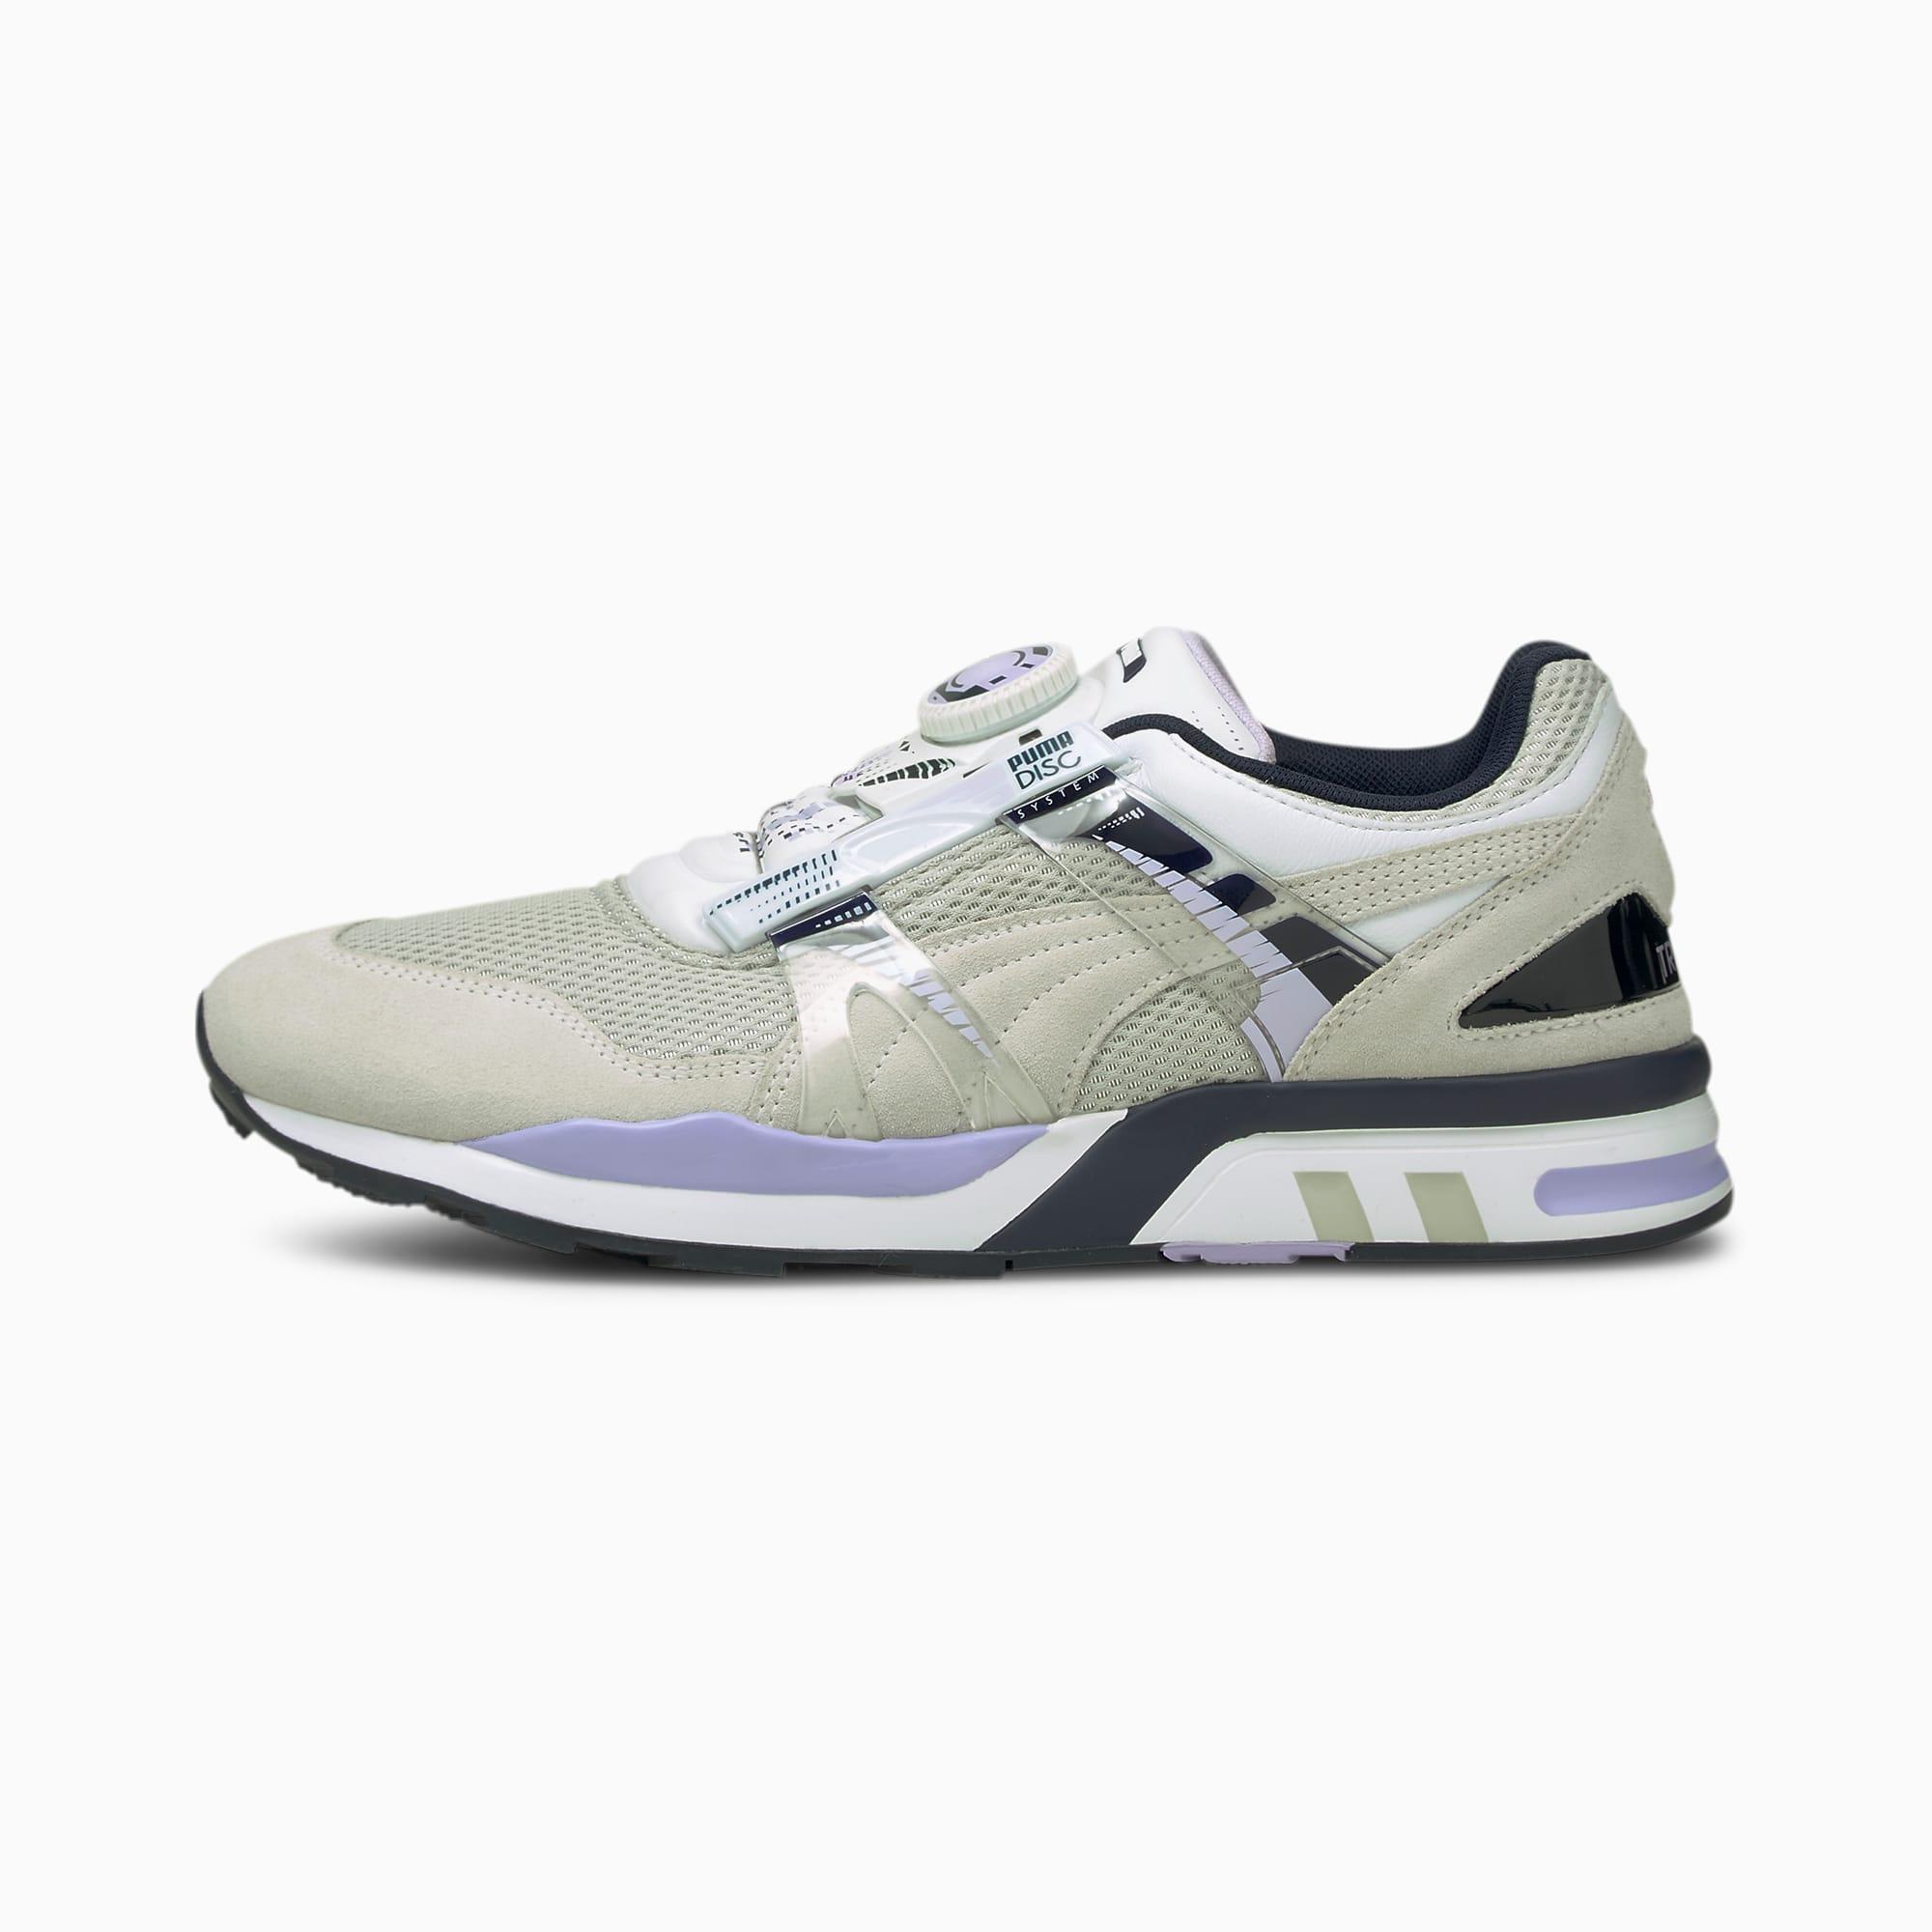 XS 7000 Vintage Men's Sneakers